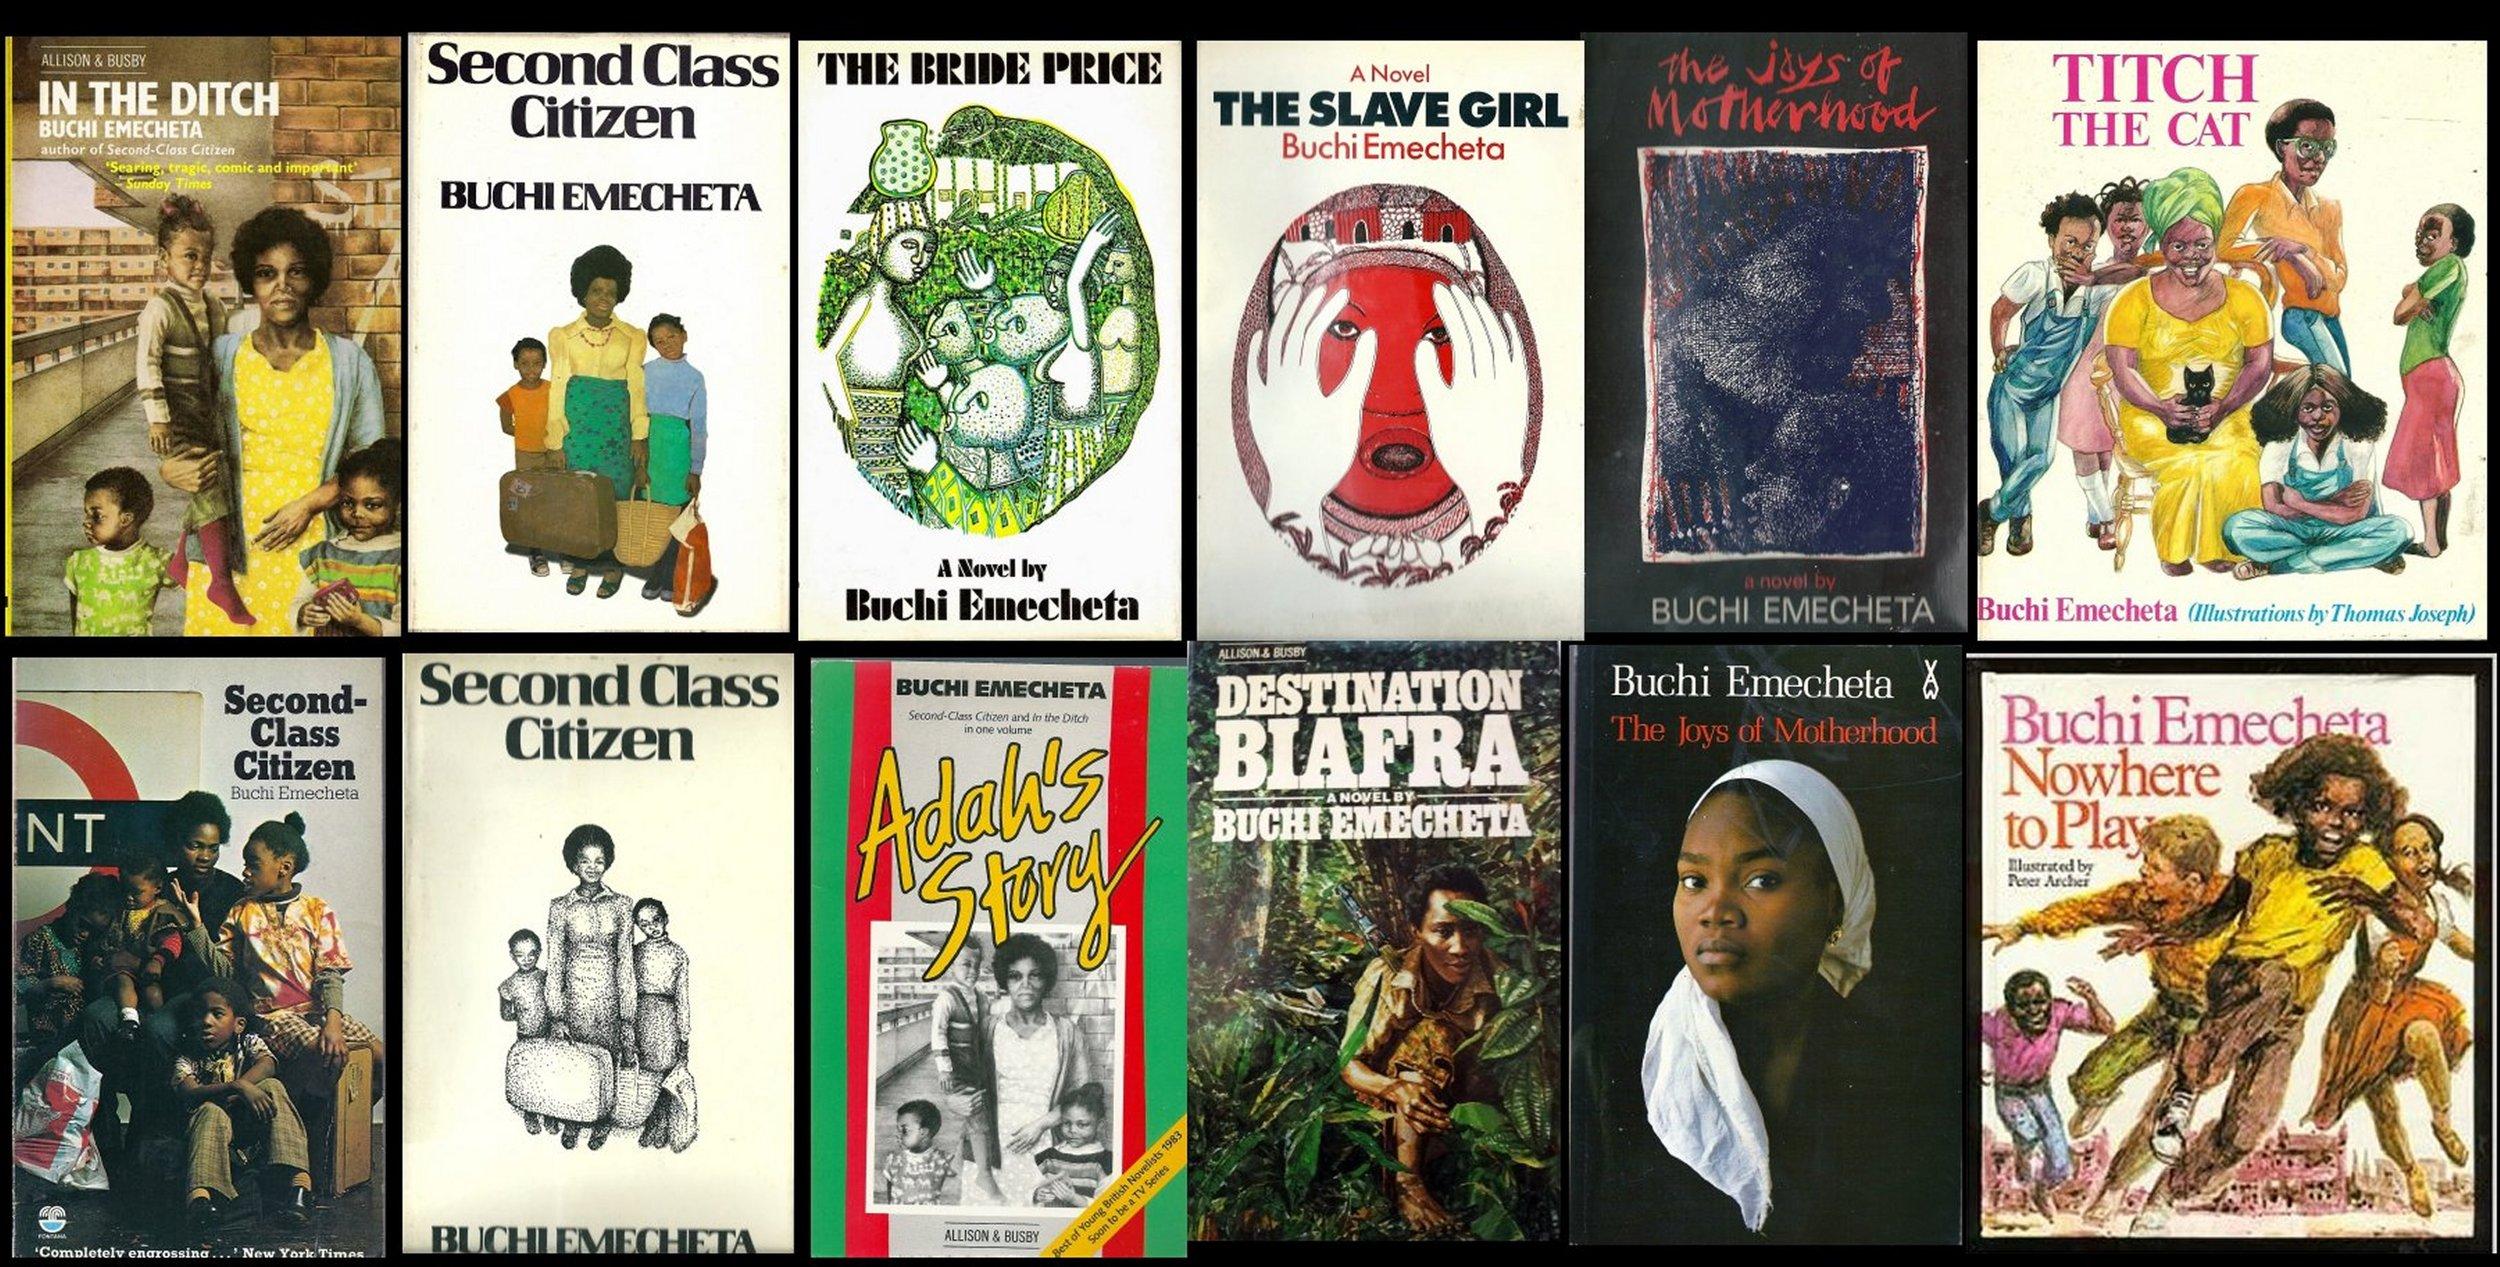 Buchi Emecheta titles published by Allison & Busby. Photo courtesy of Margaret Busby.